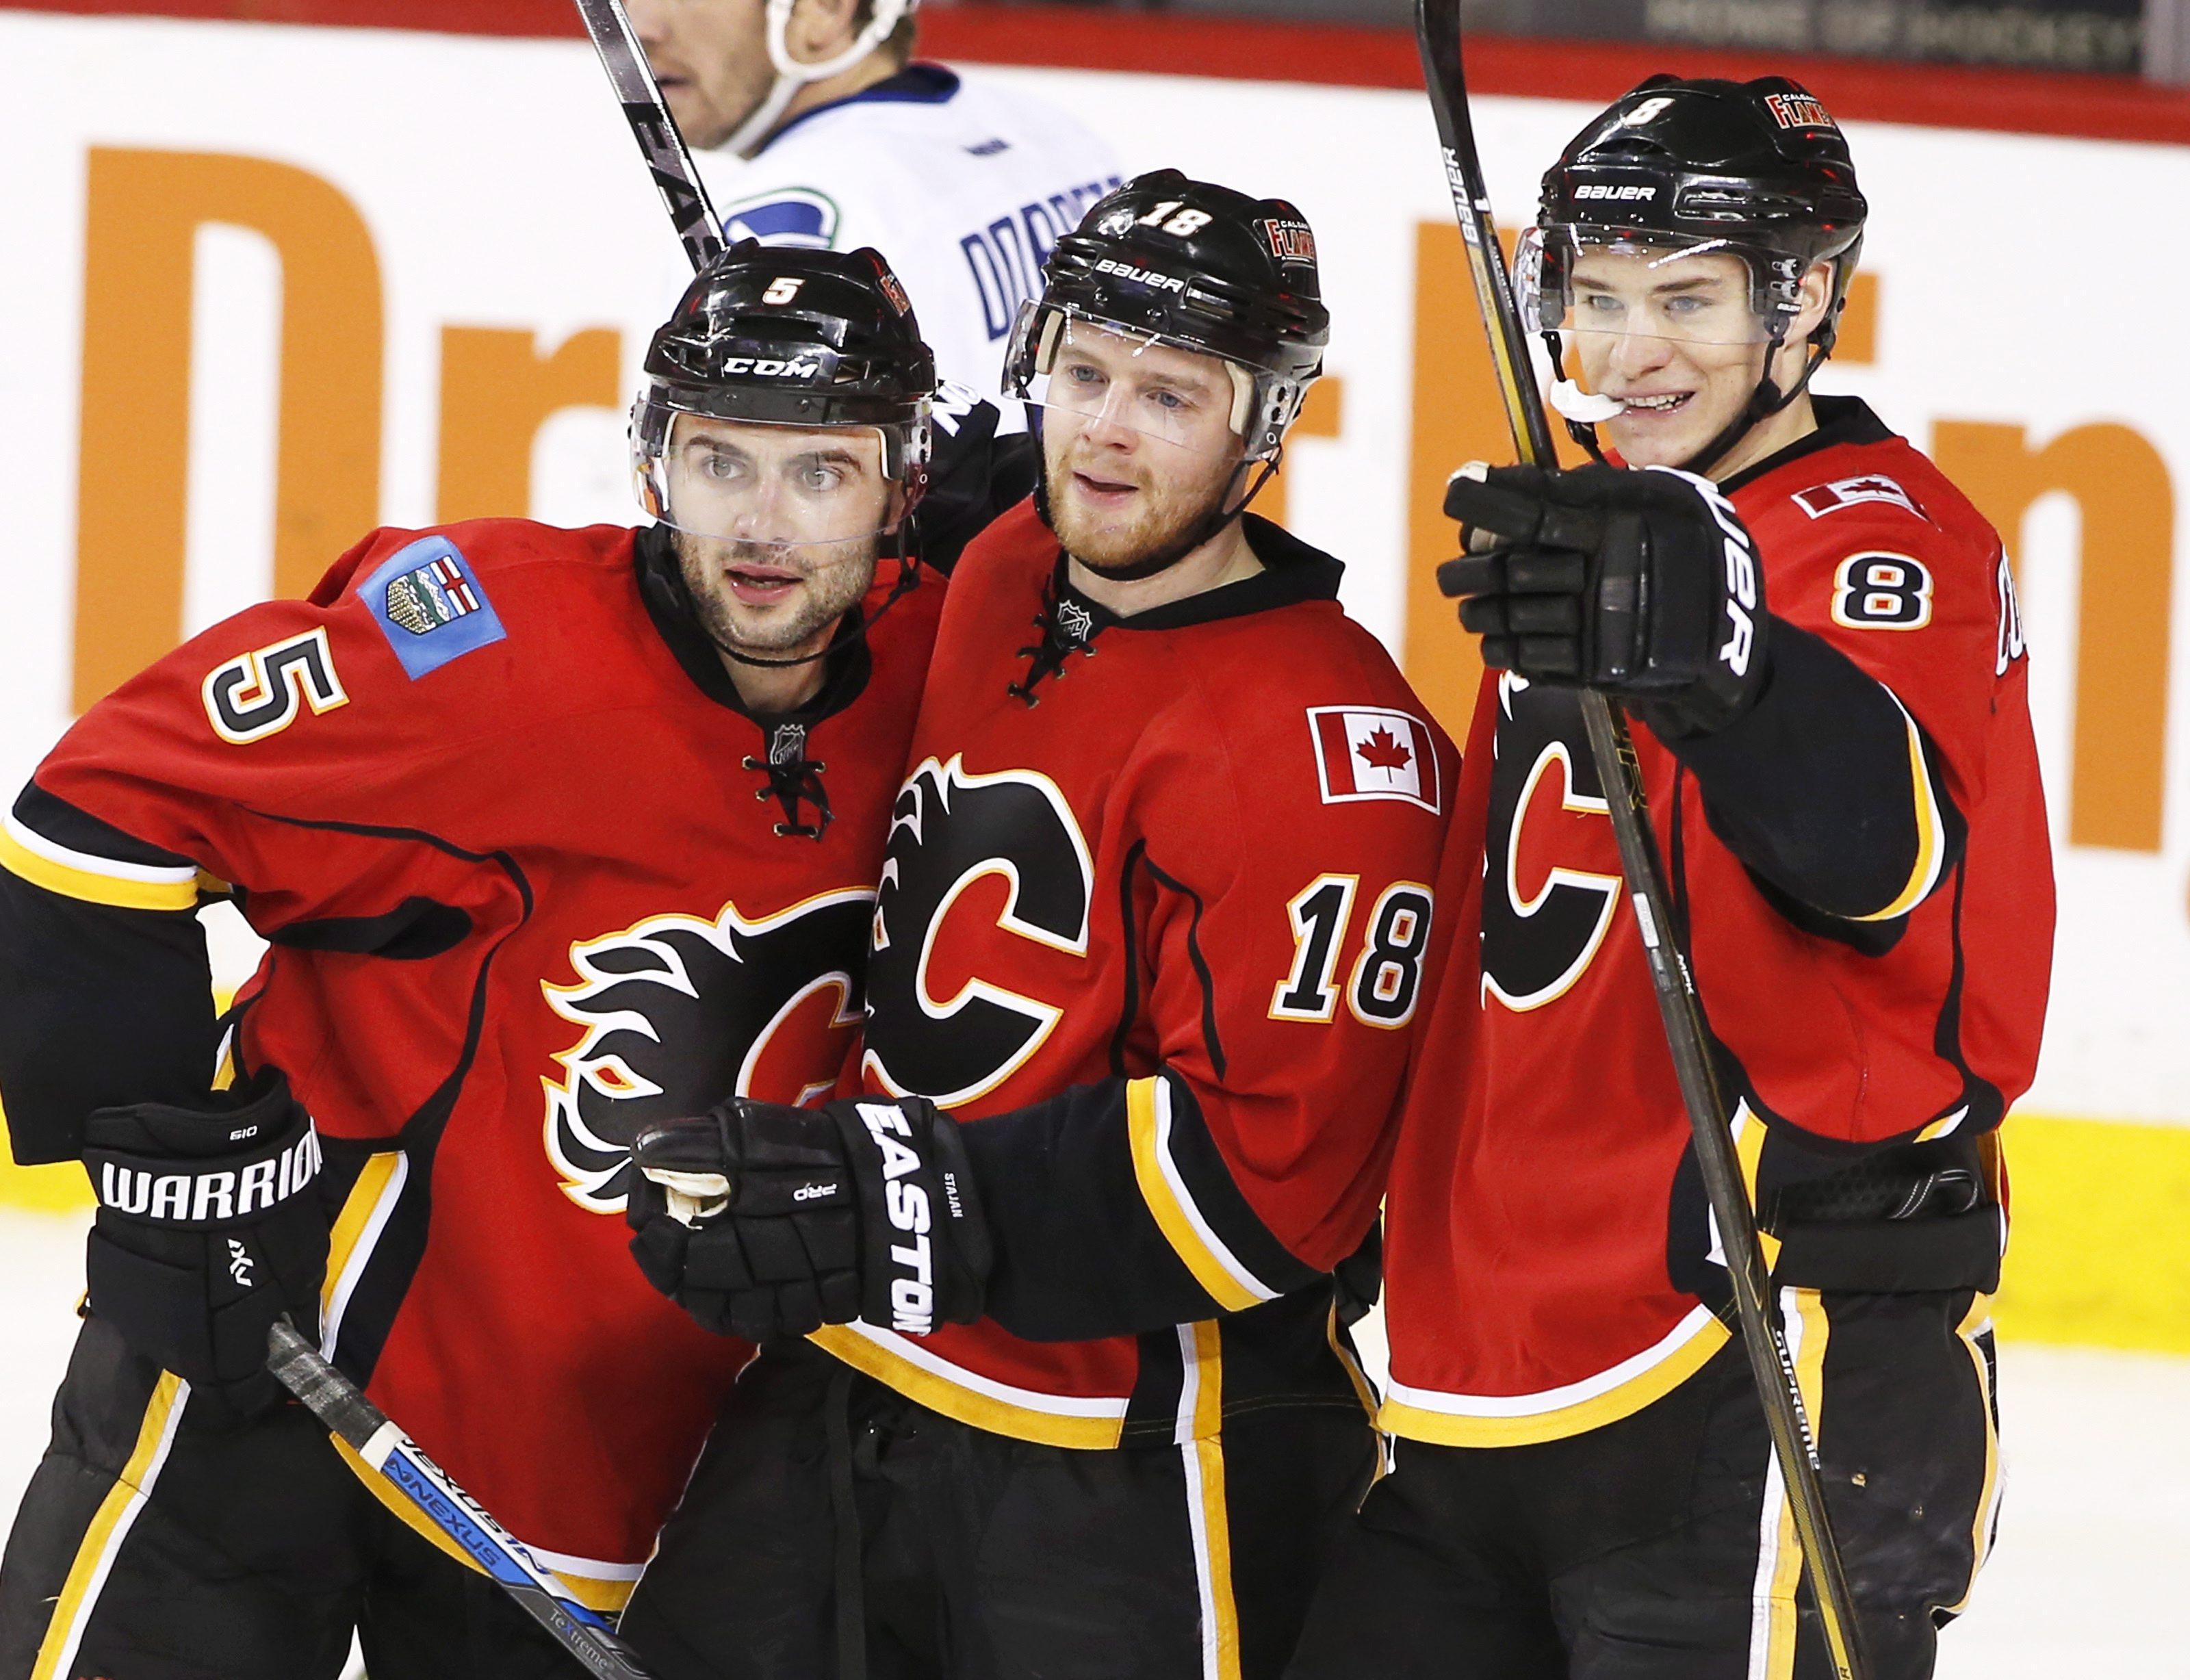 Canucks_flames_hockey